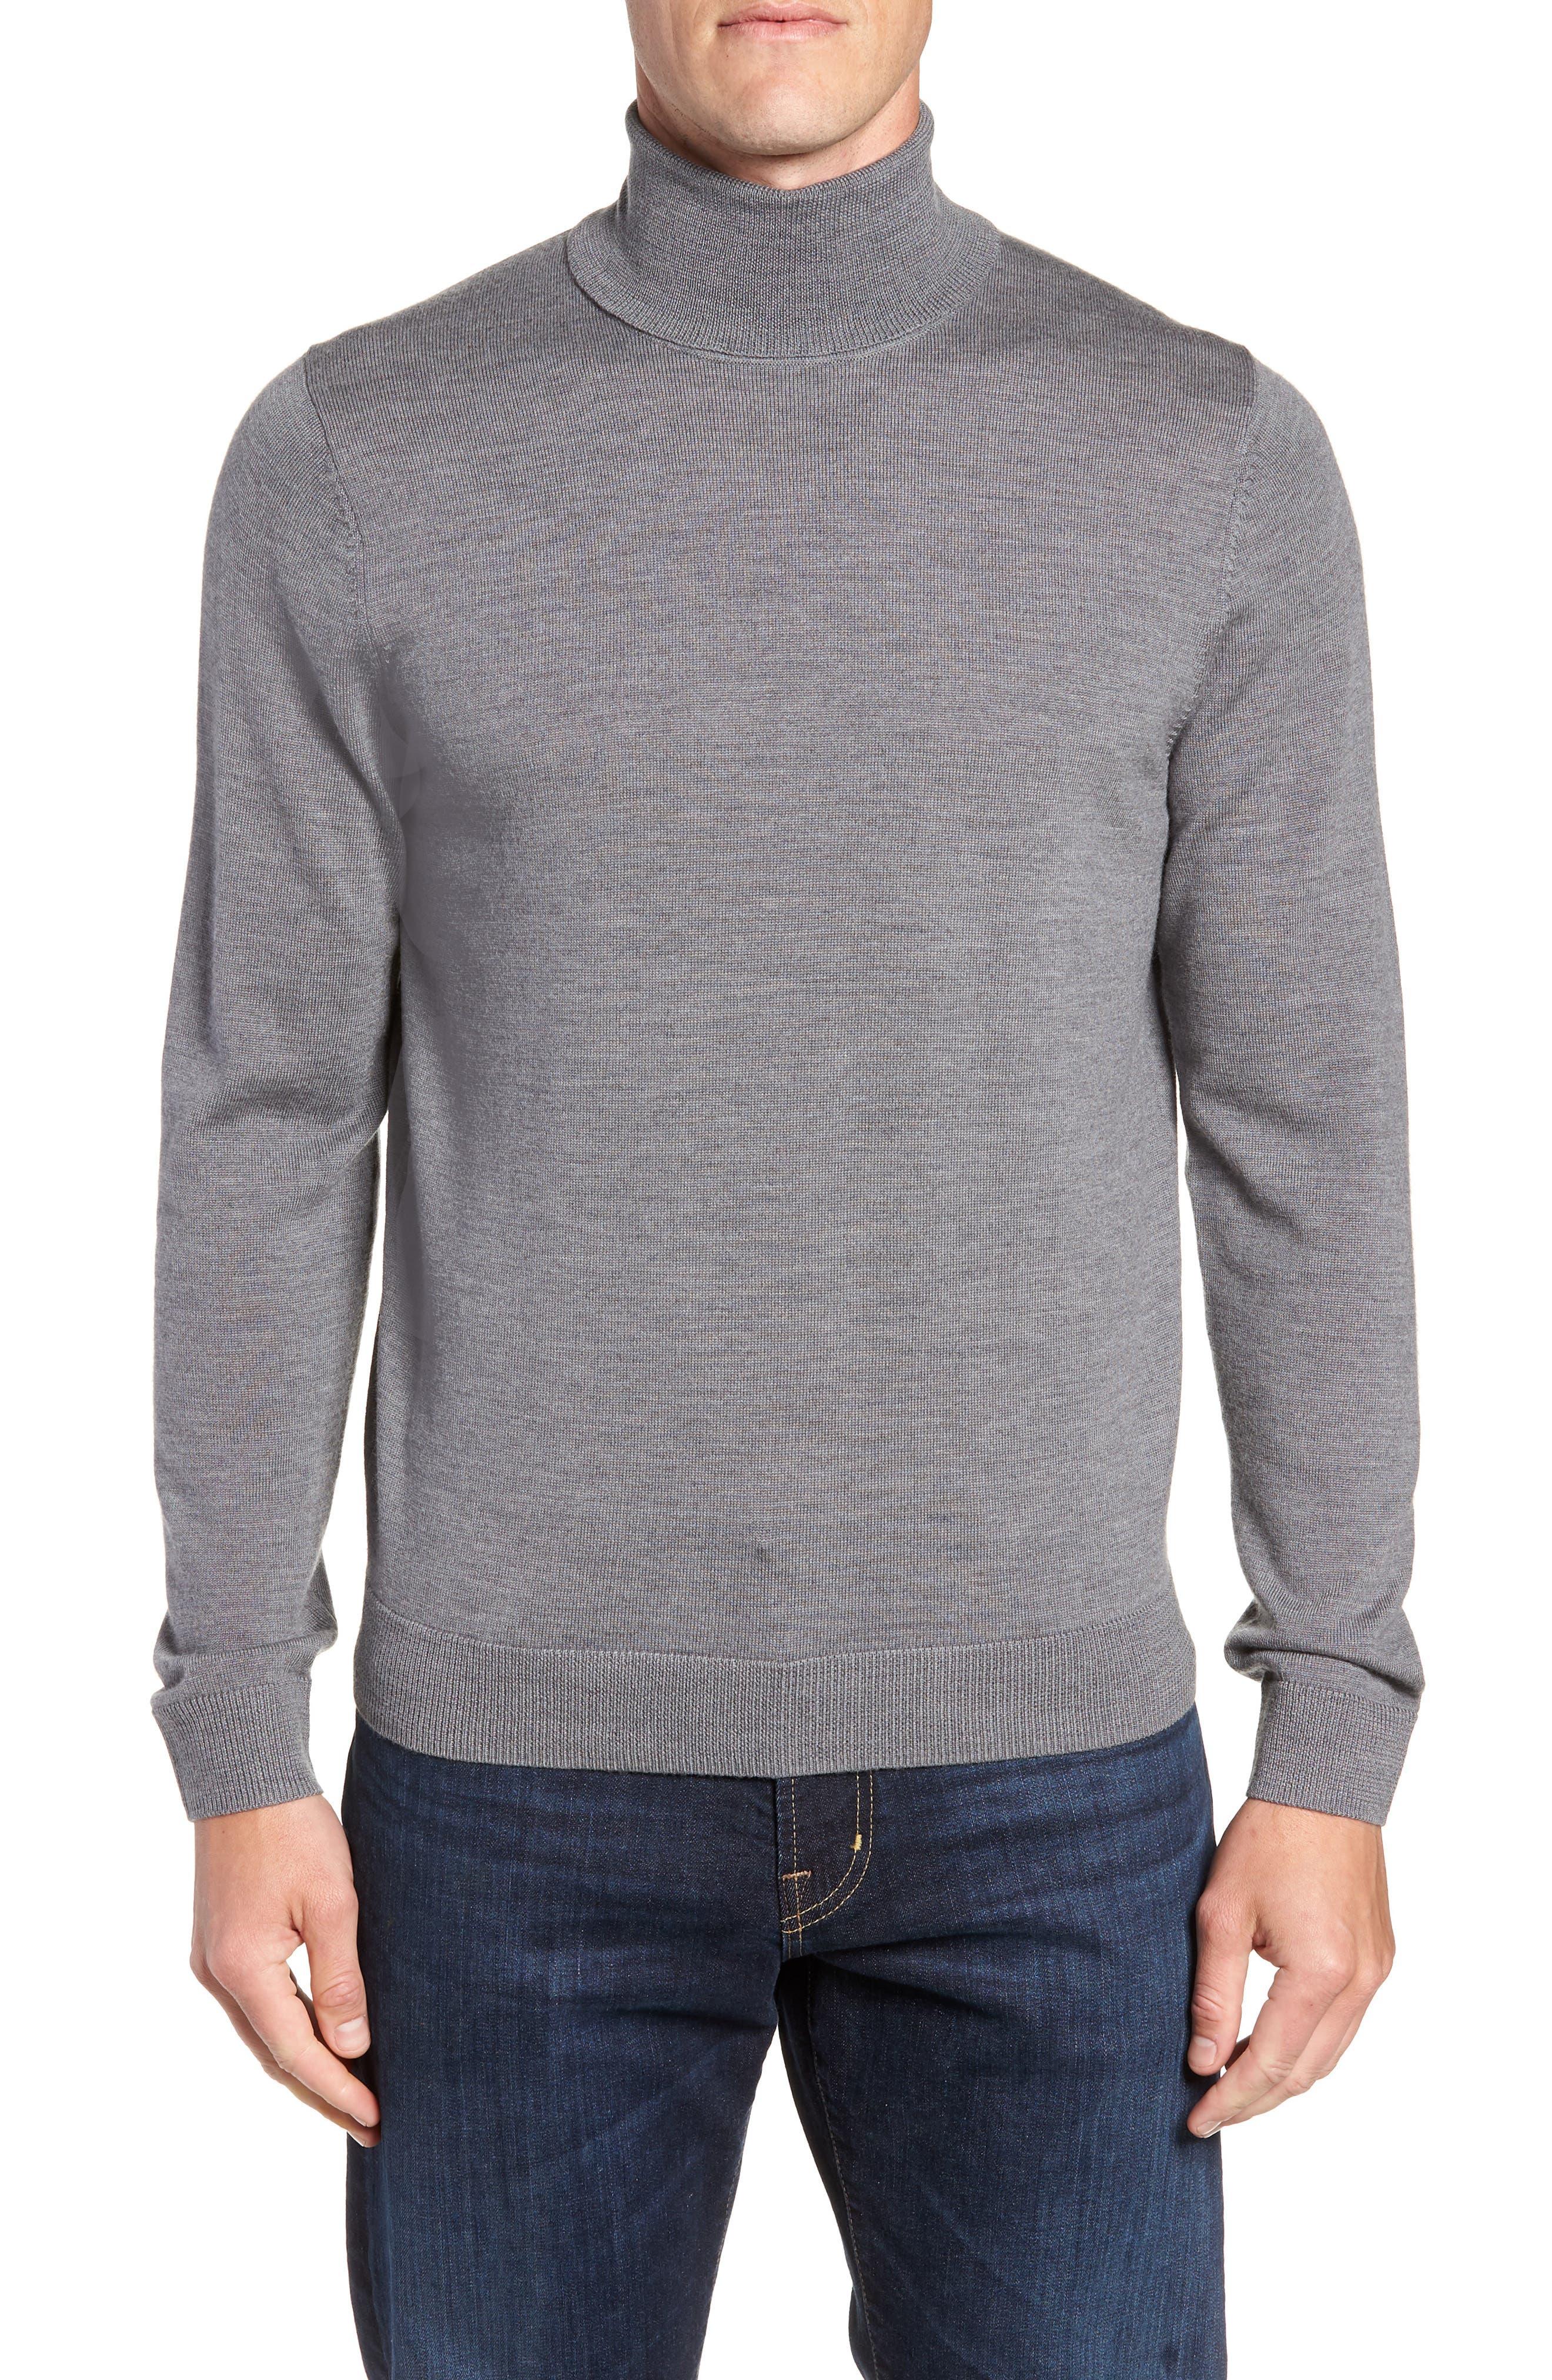 Nordstrom Shop Merino Wool Turtleneck Sweater, Grey